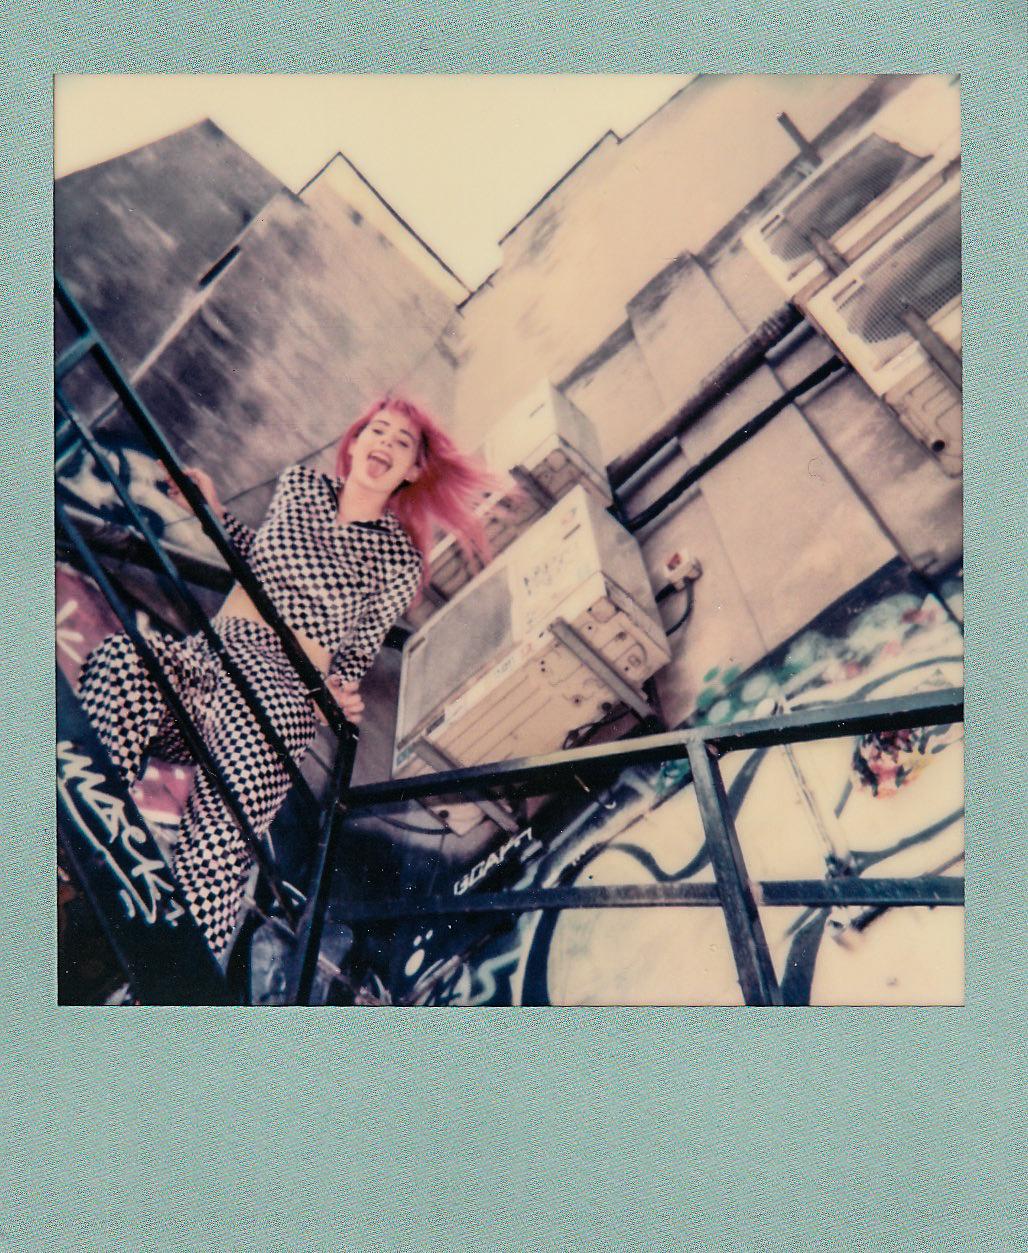 Girli Polaroid Finals - The Old Blue Last - 26.07.2018 -  Ant Adams-1.jpg